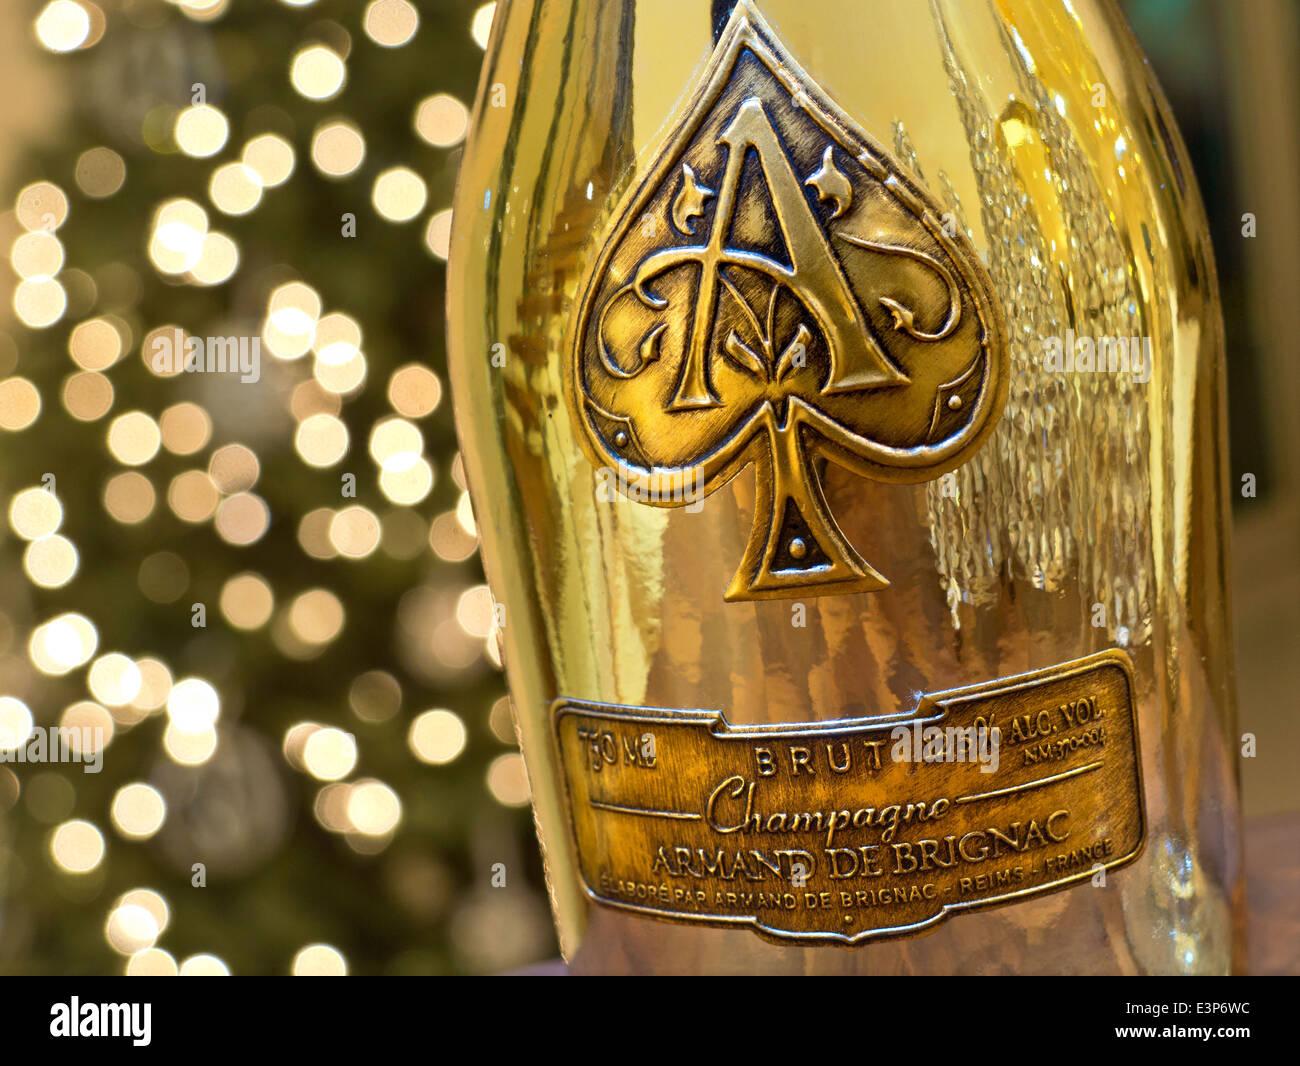 Distinctive metallic gold bottle of Armand de Brignac ' Ace of Spades'' fine luxury champagne with sparkling - Stock Image